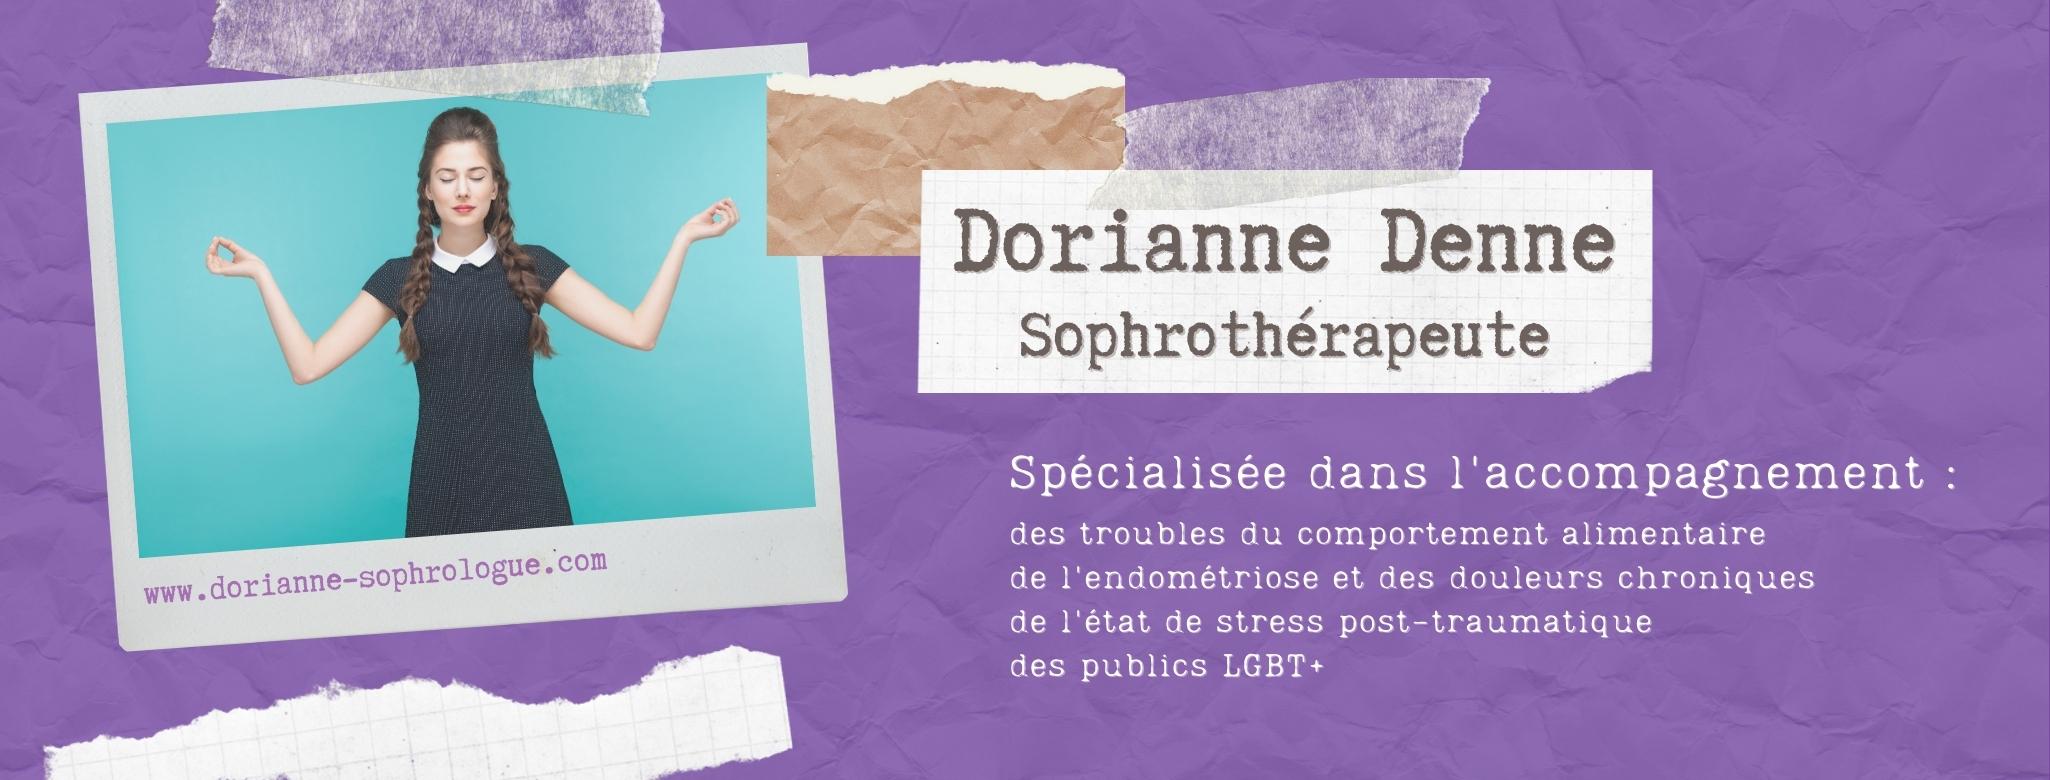 Dorianne Denne Sophrothérapeute